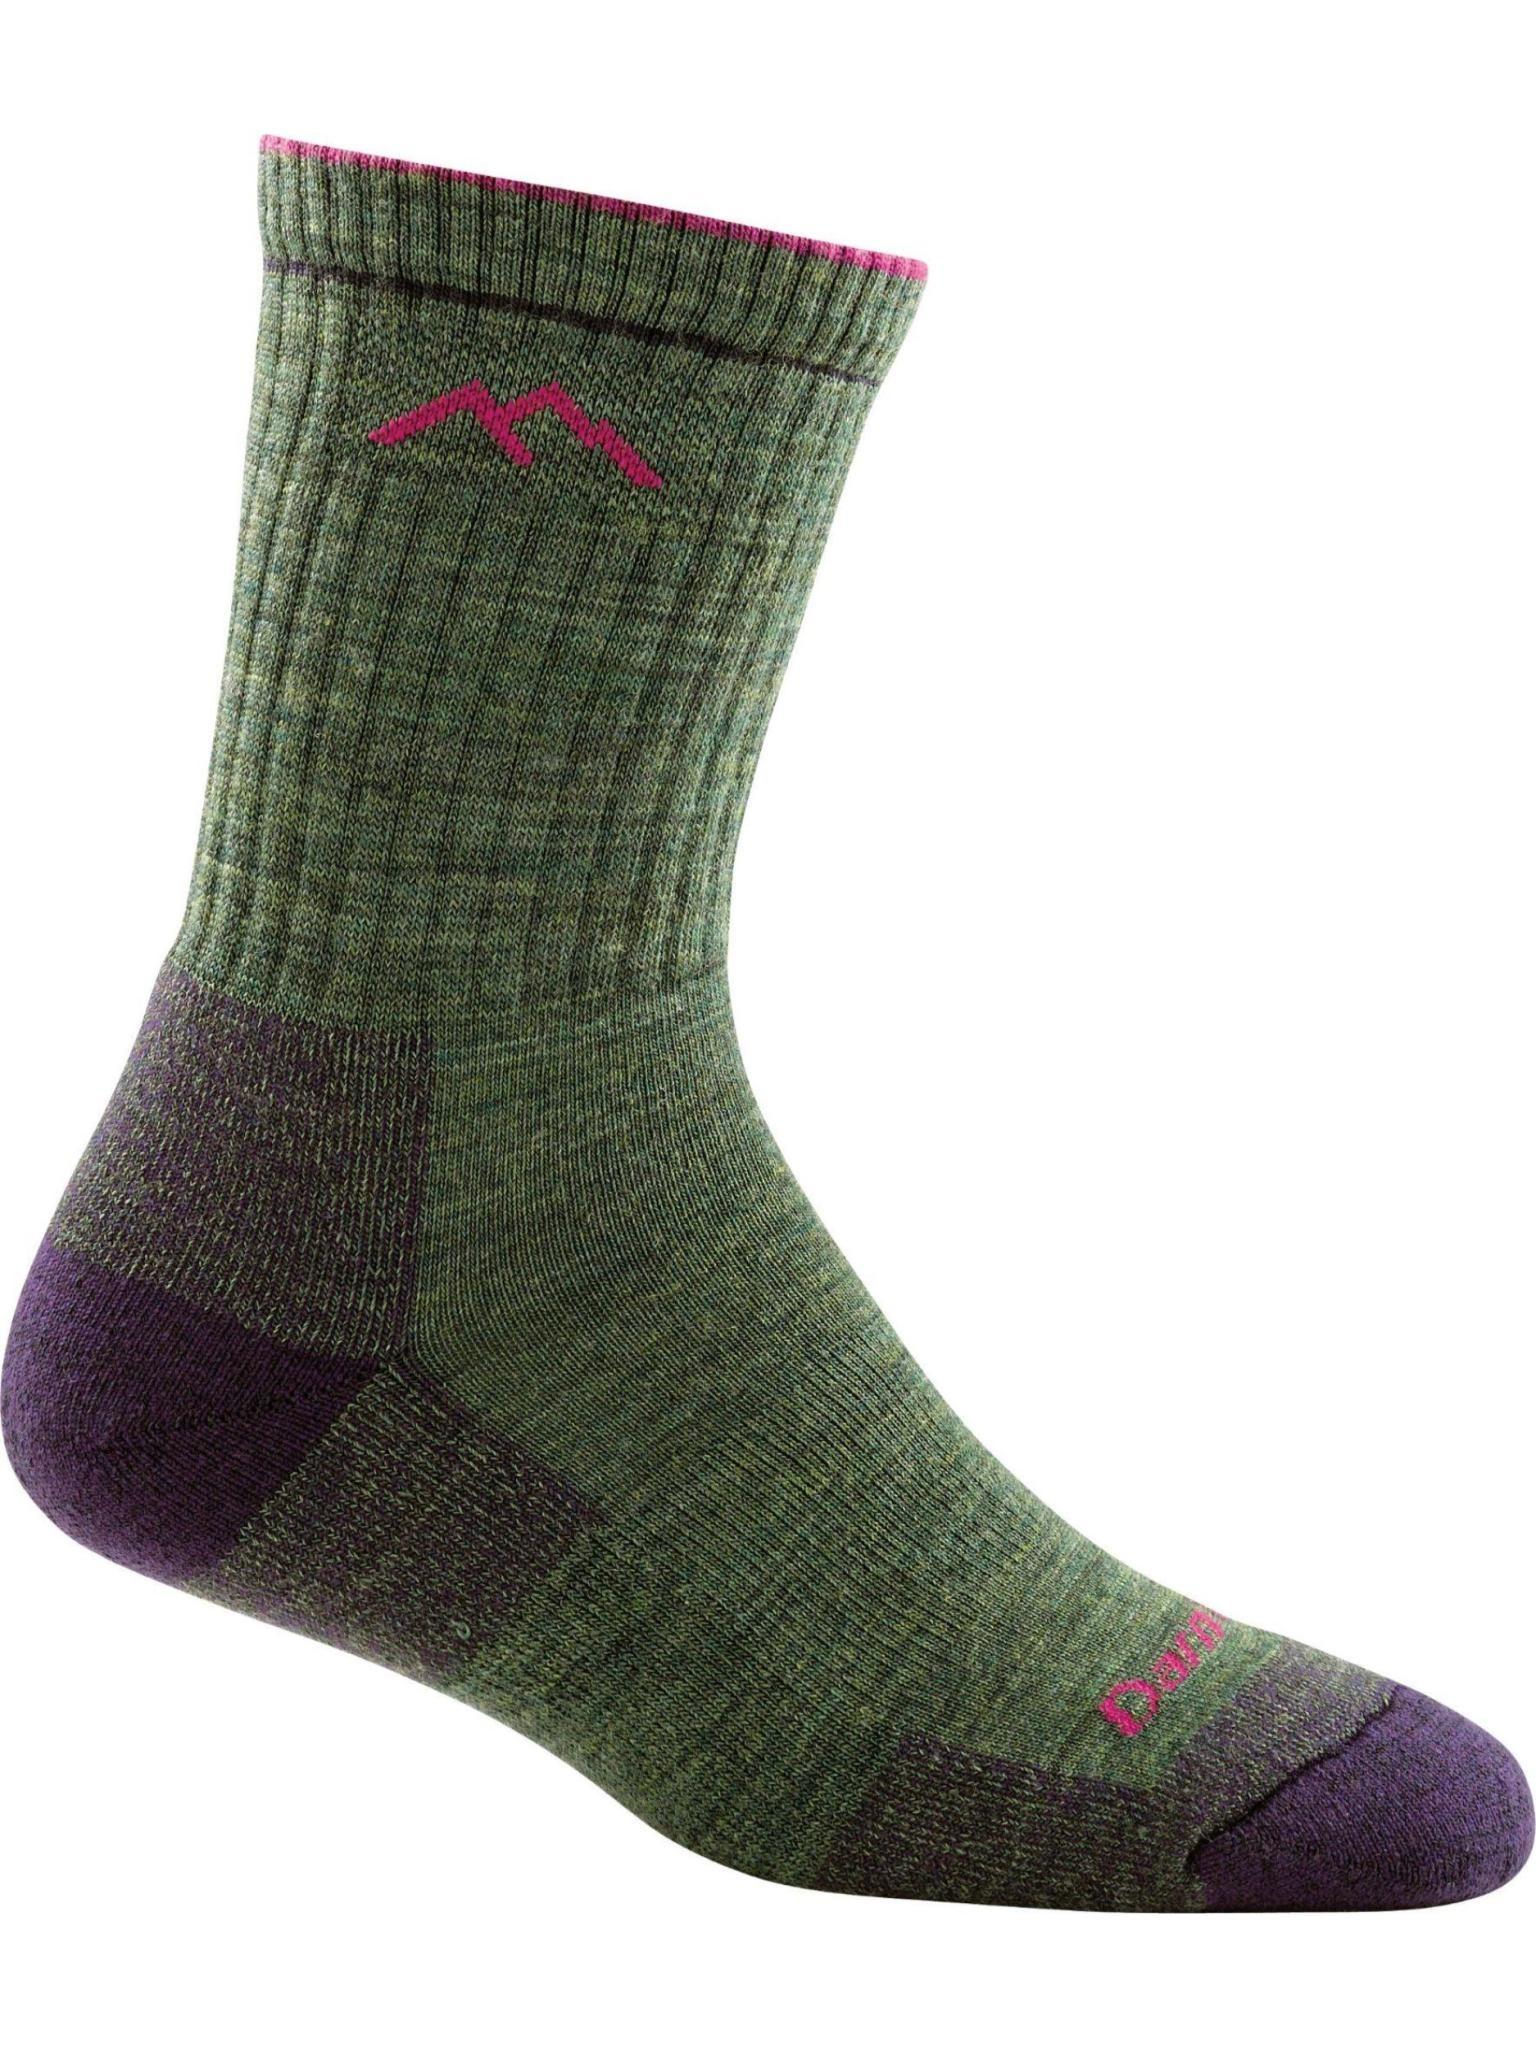 Darn Tough Women's Hiker Midweight Cushion Micro Crew Sock